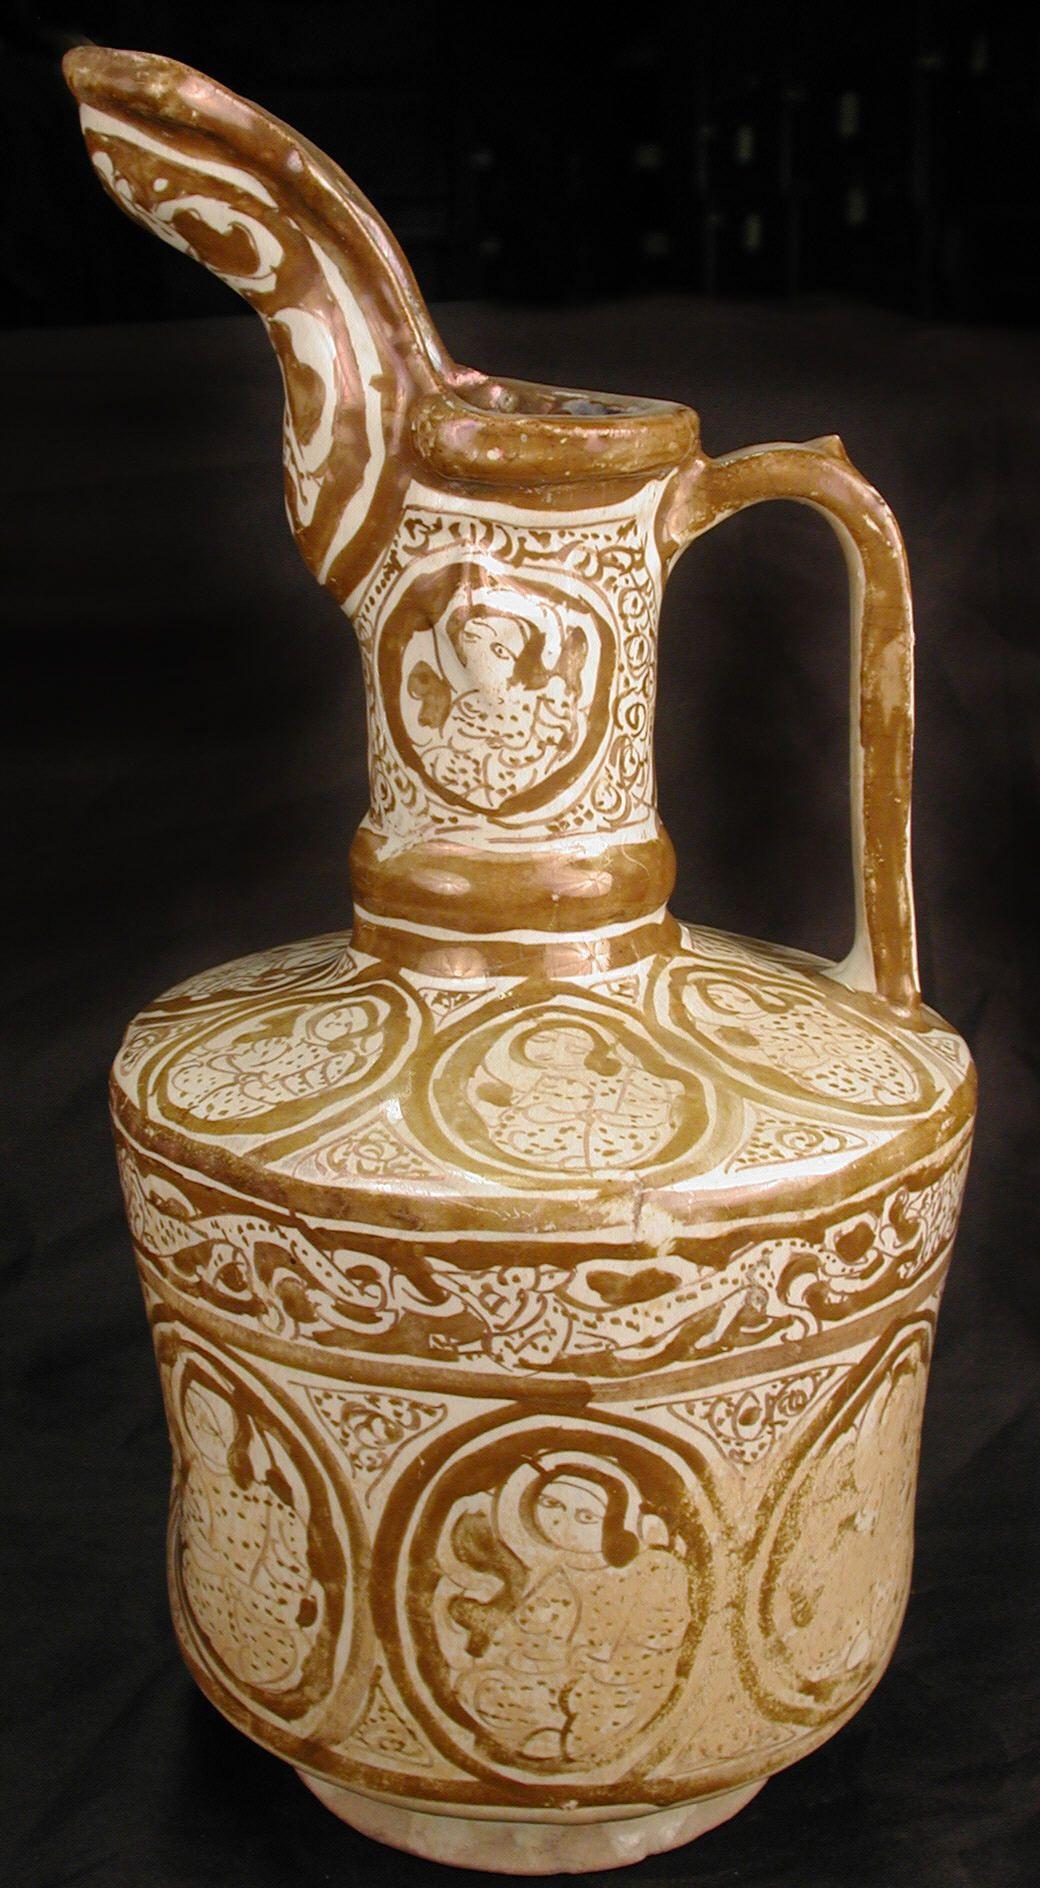 Ewer date 12th century geography iran culture islamic